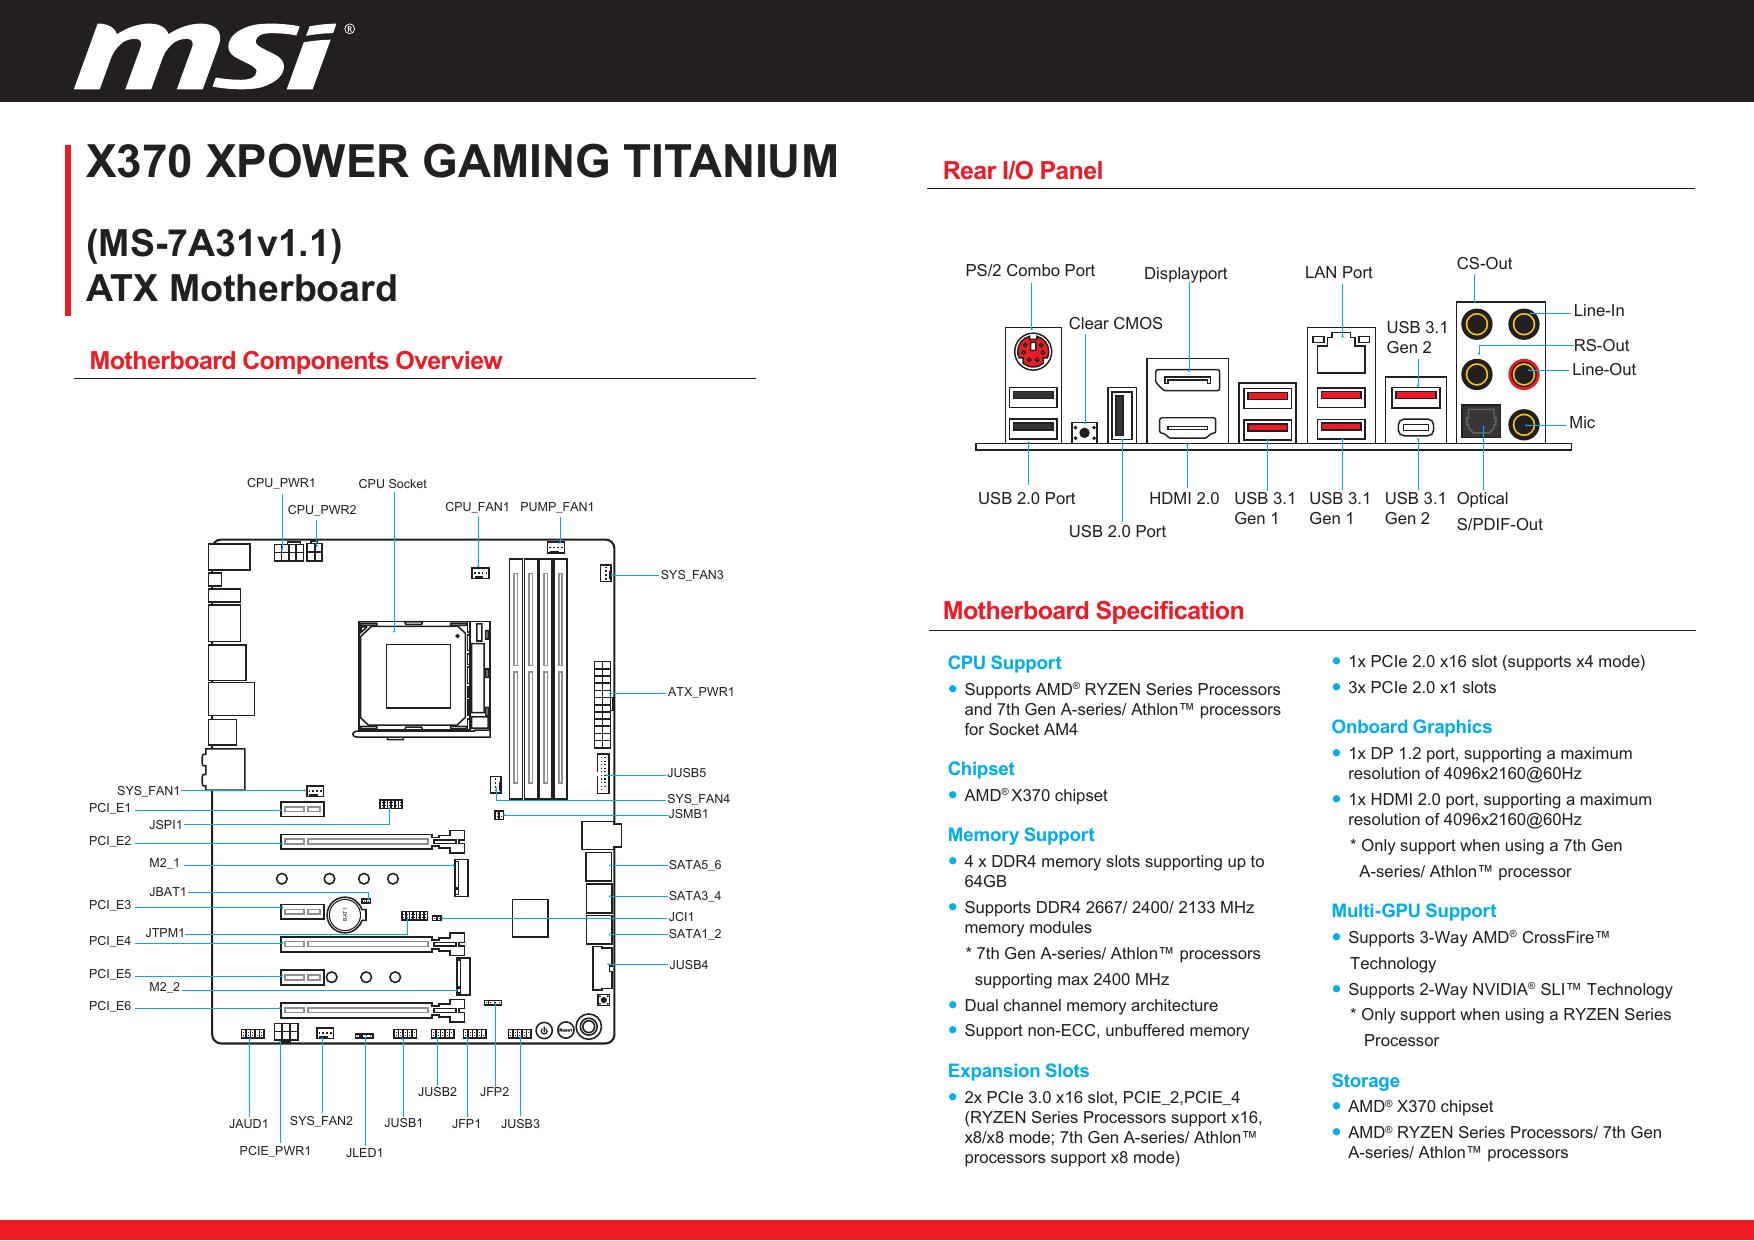 X370 Xpower Gaming Titanium Manualzz